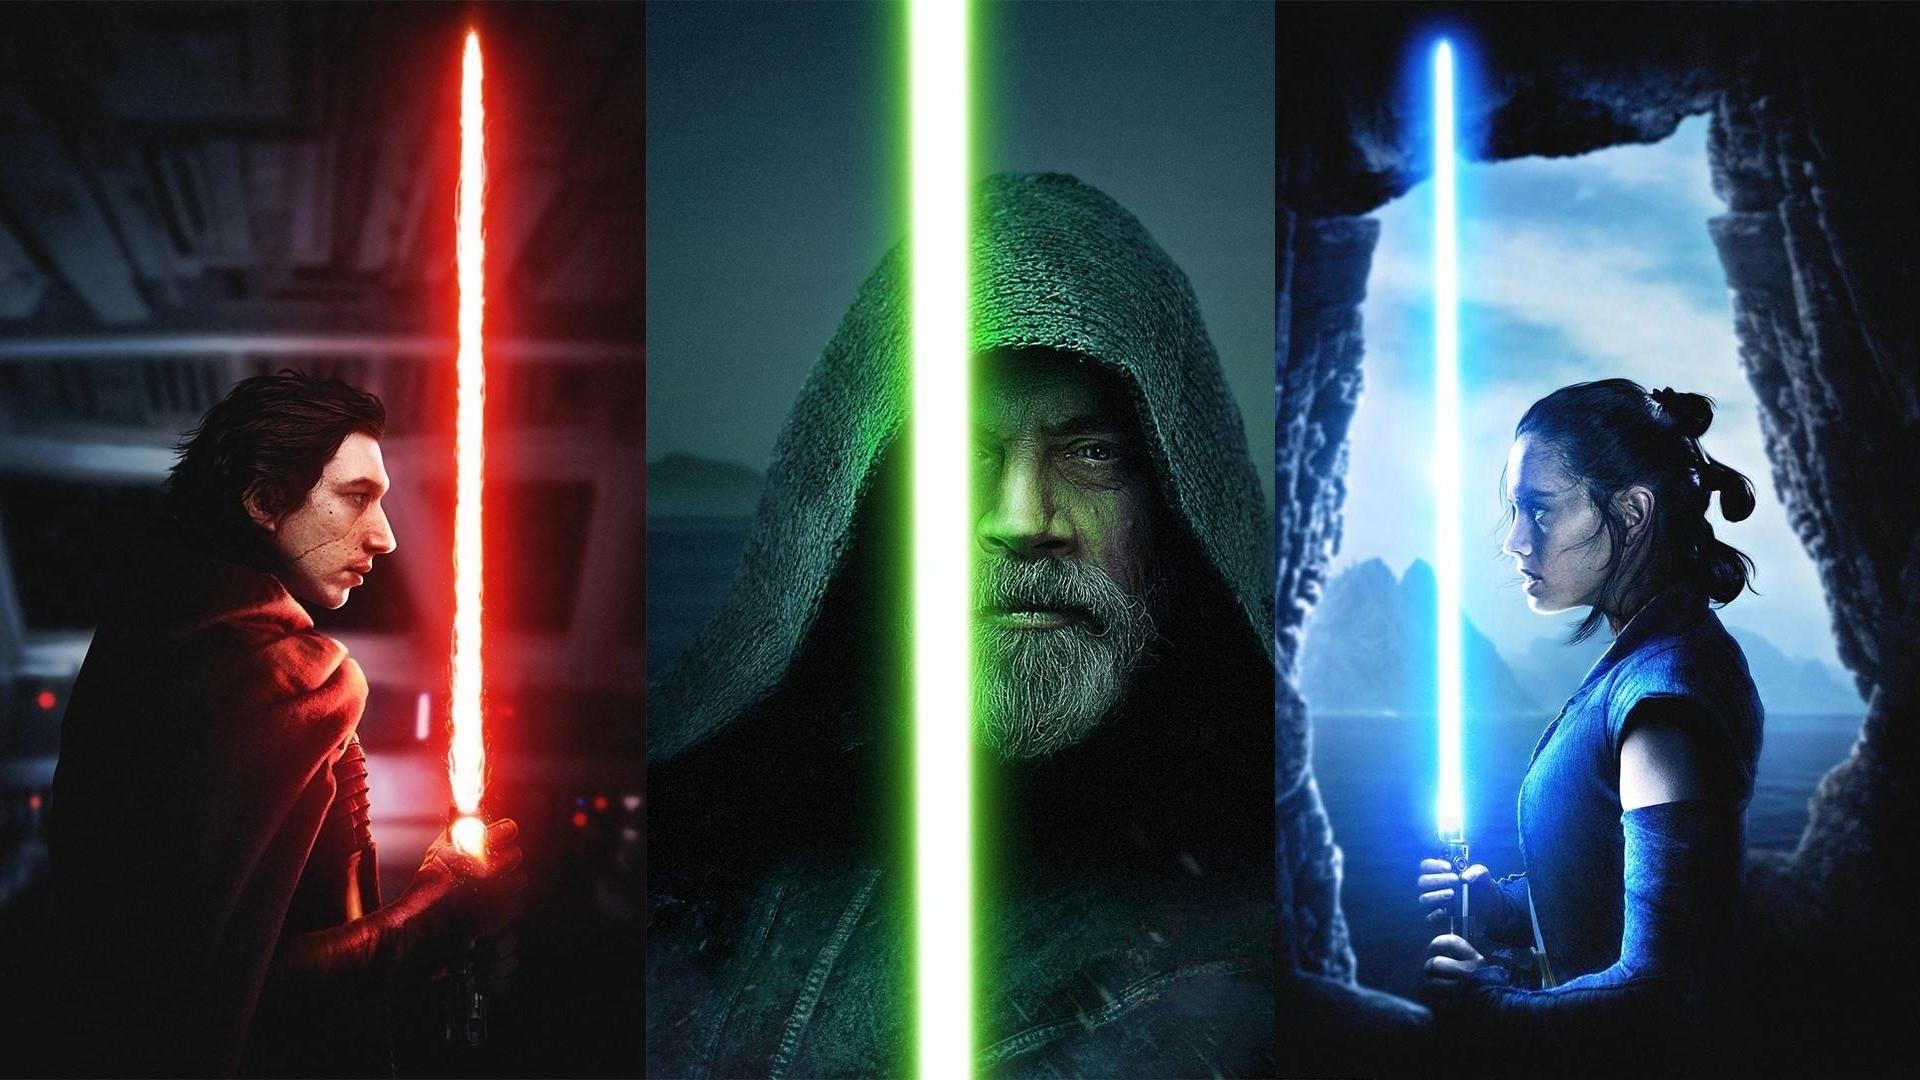 Star Wars The Last Jedi Desktop Wallpaper: Desktop Wallpaper Star Wars: The Last Jedi, Poster